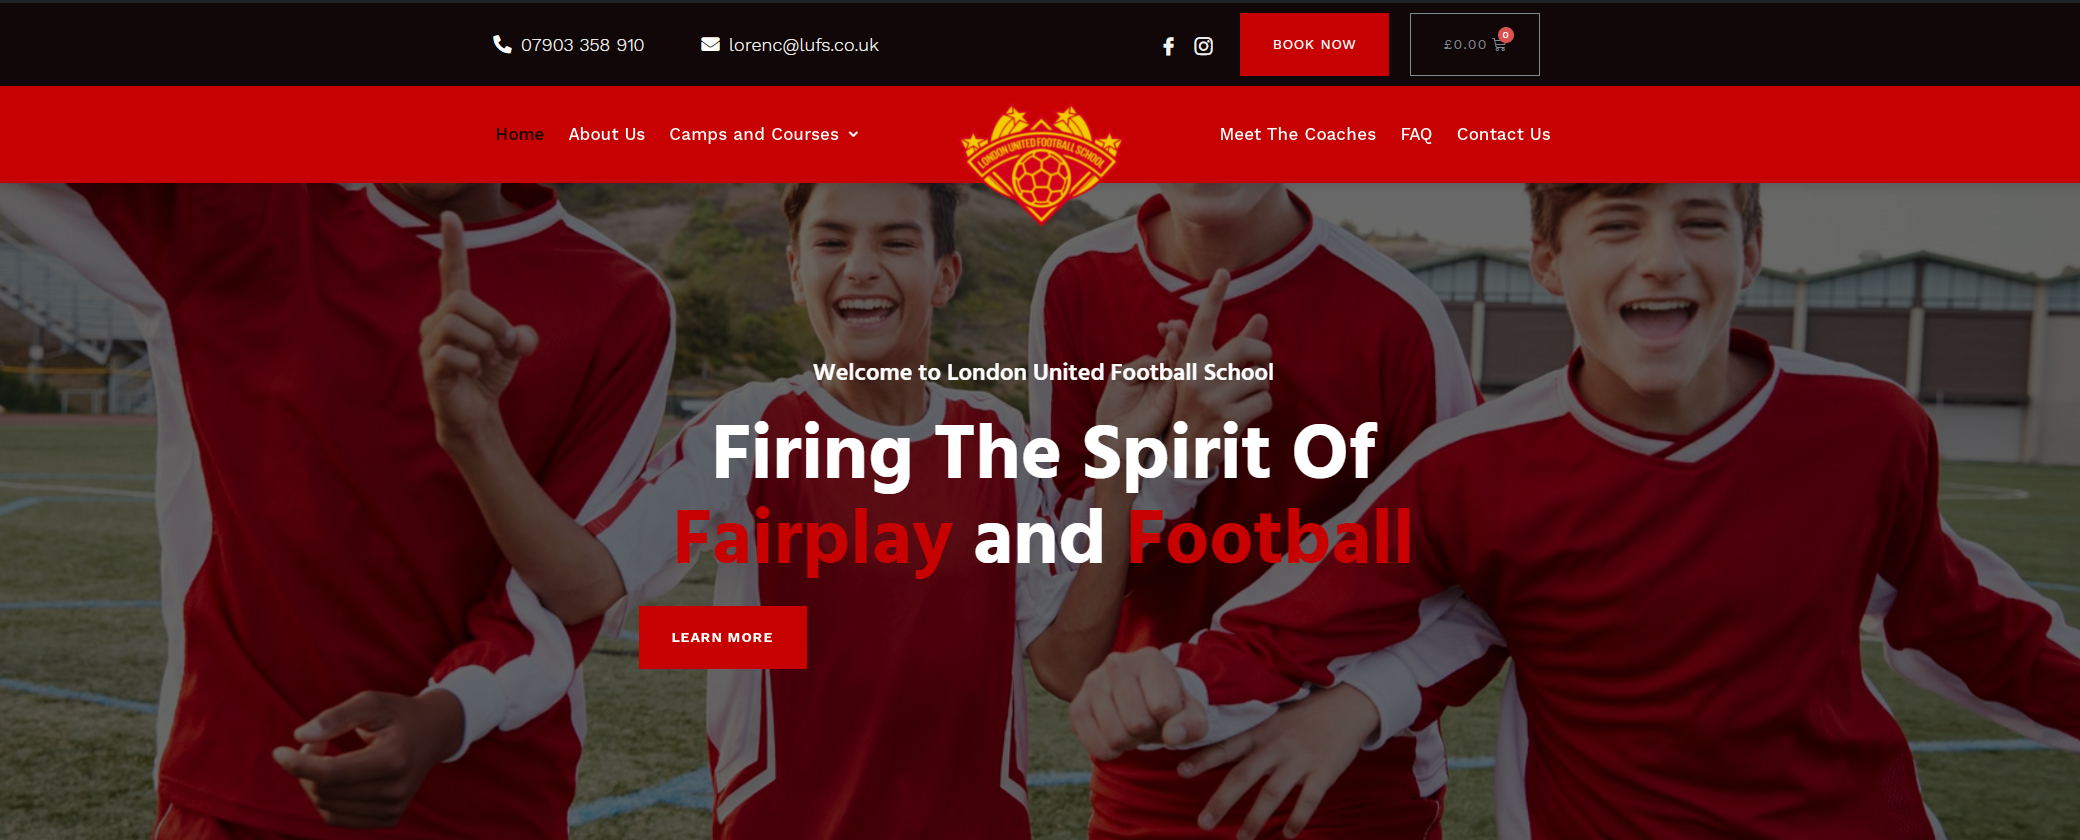 London United Football School Website